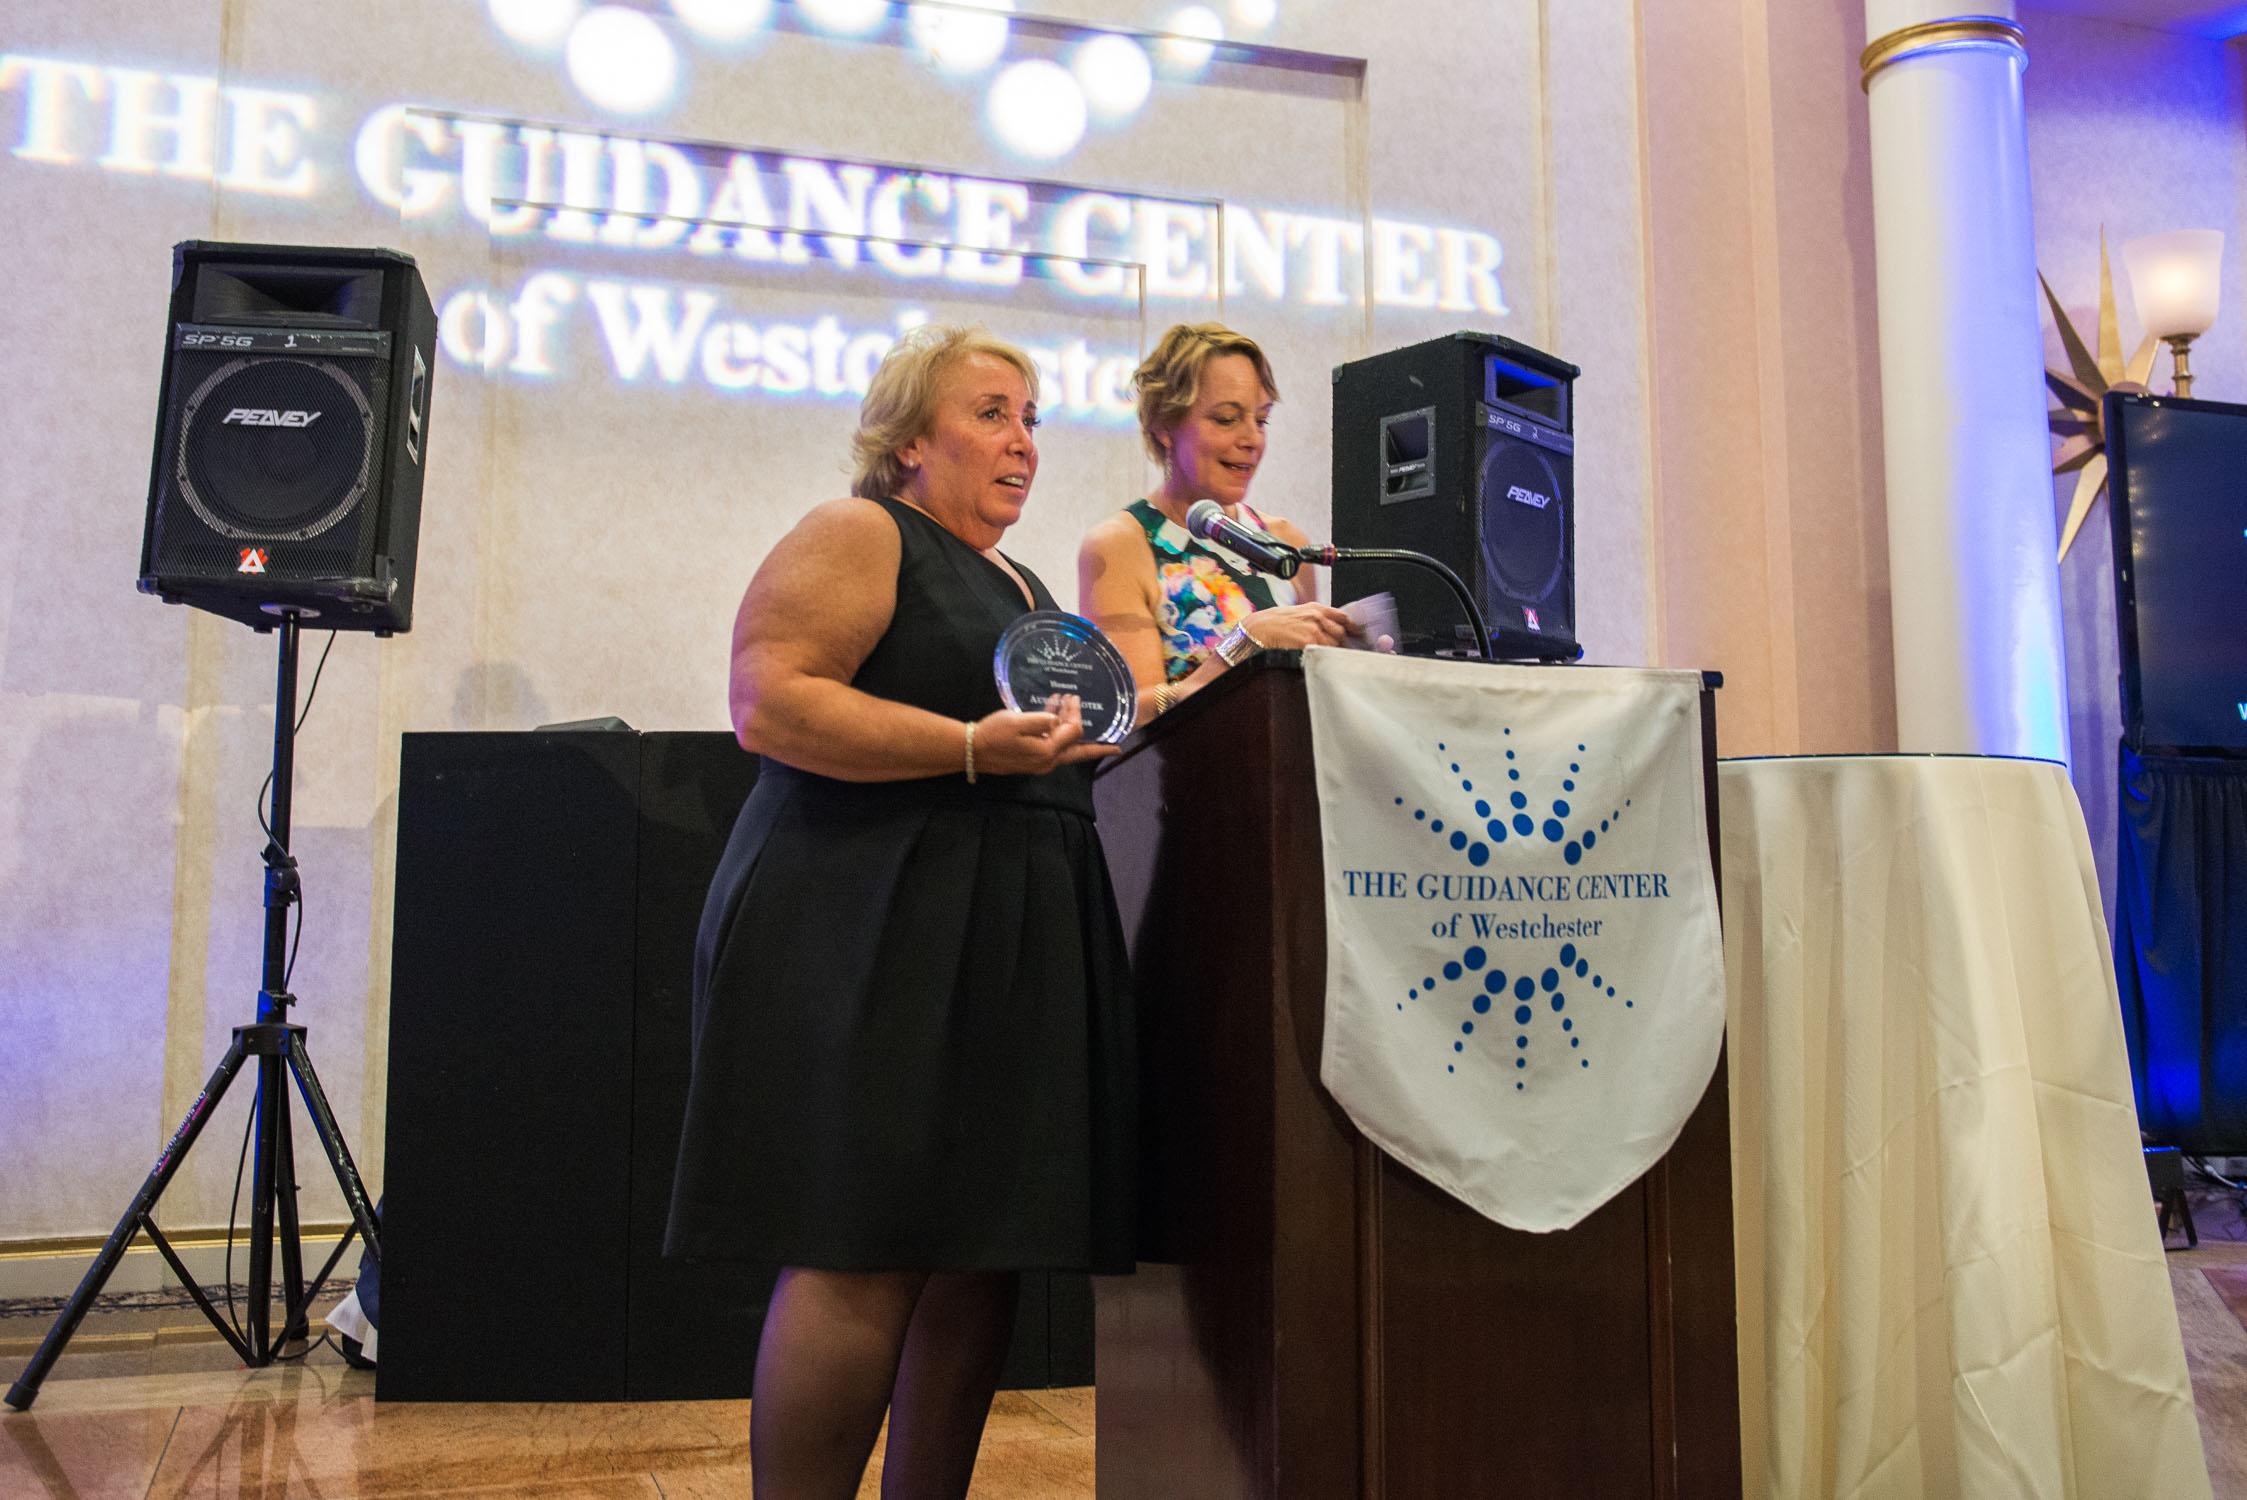 Guidance center gala 2016-3159.jpg